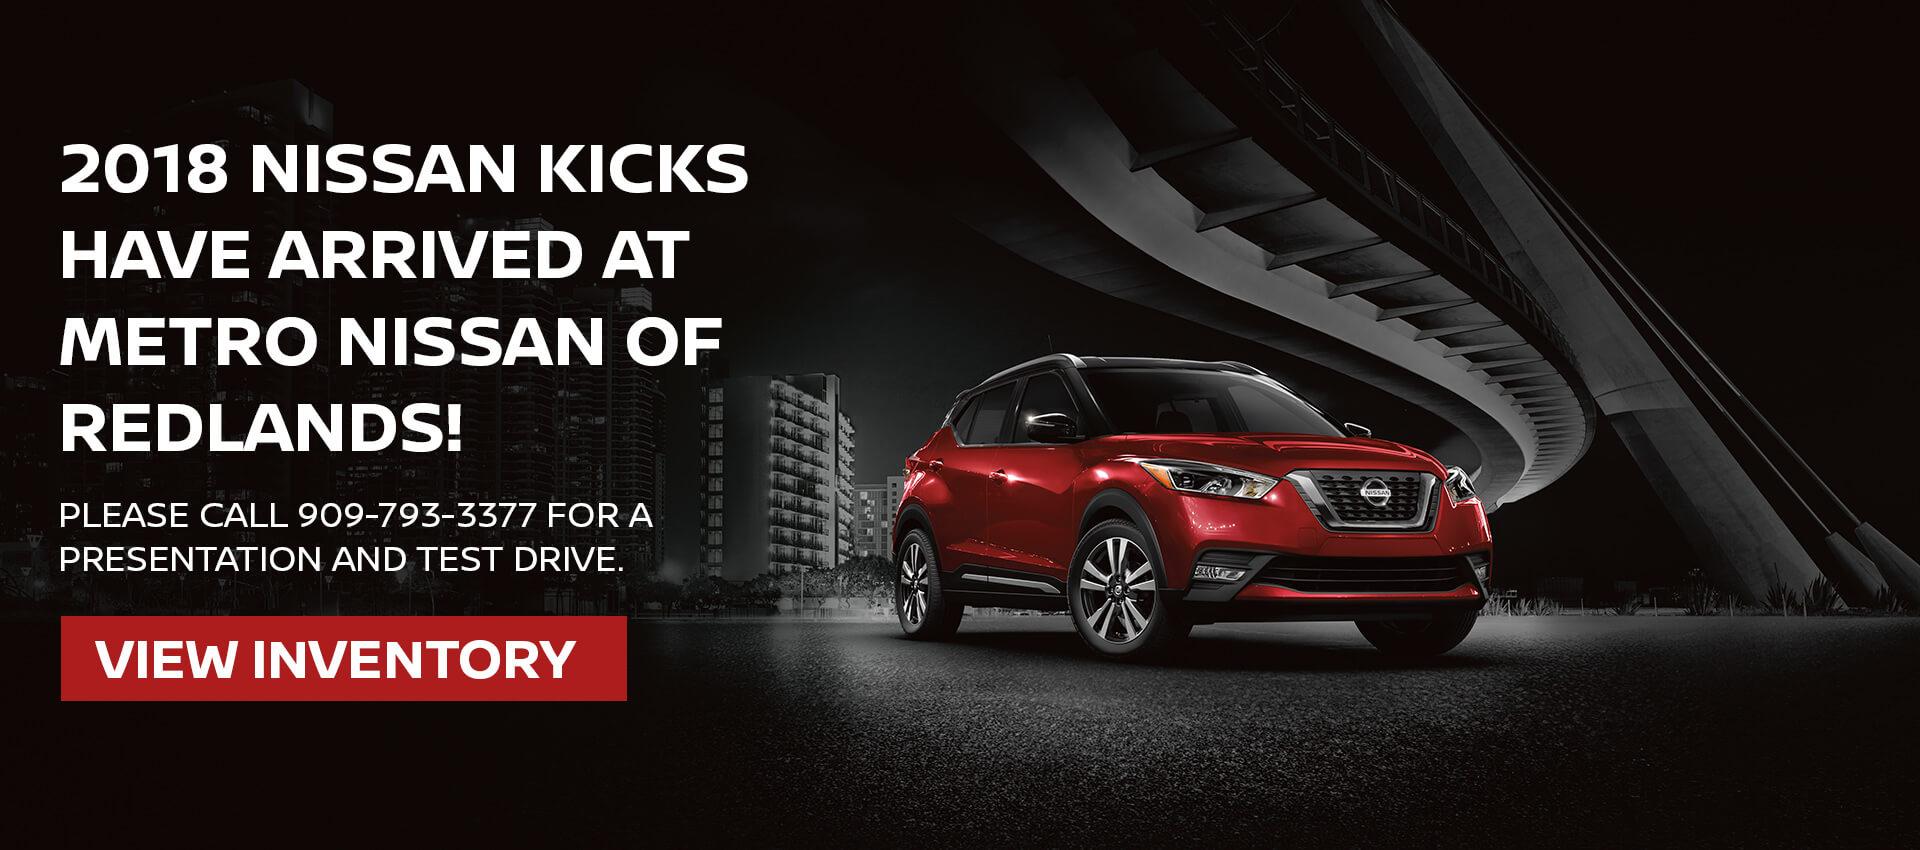 2018 Nissan Kicks is here